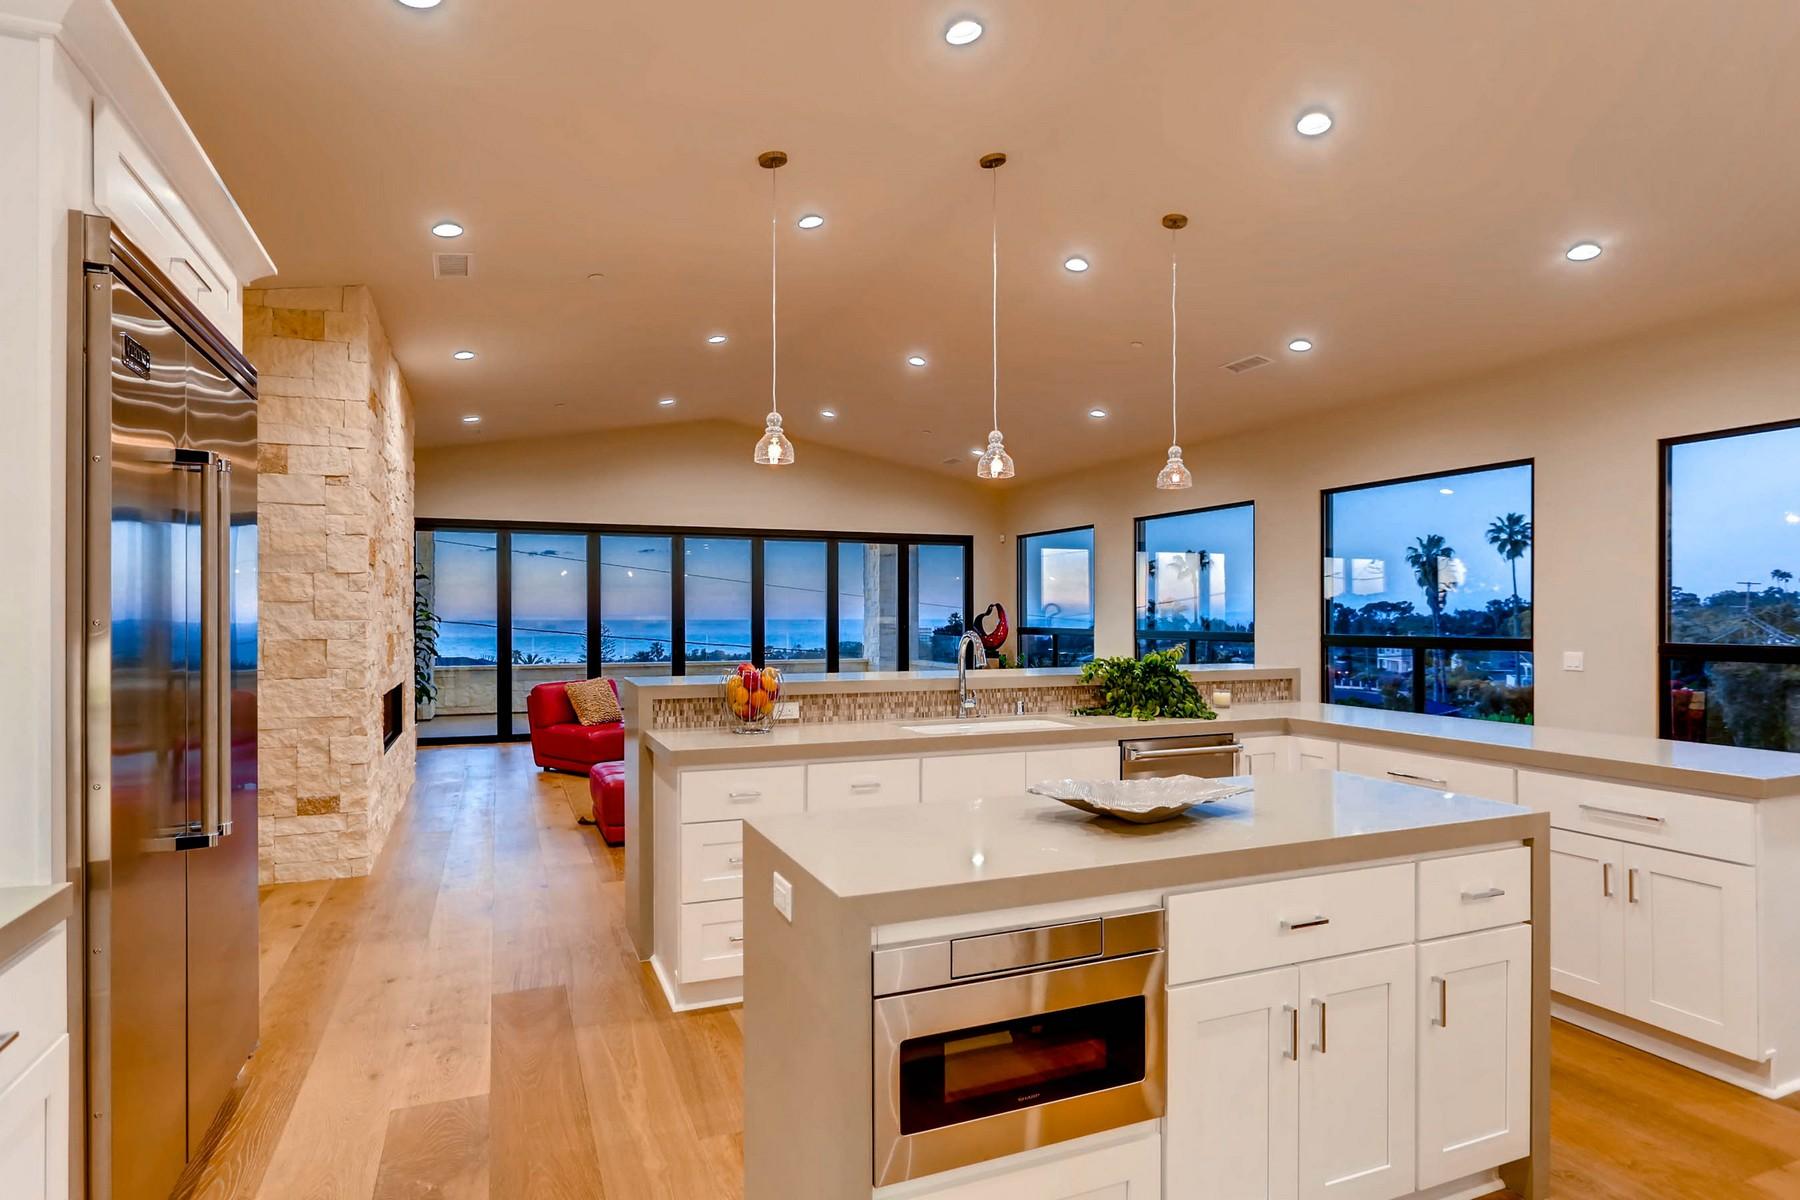 Additional photo for property listing at 1222 Muirlands Vista Way  La Jolla, Californie 92037 États-Unis